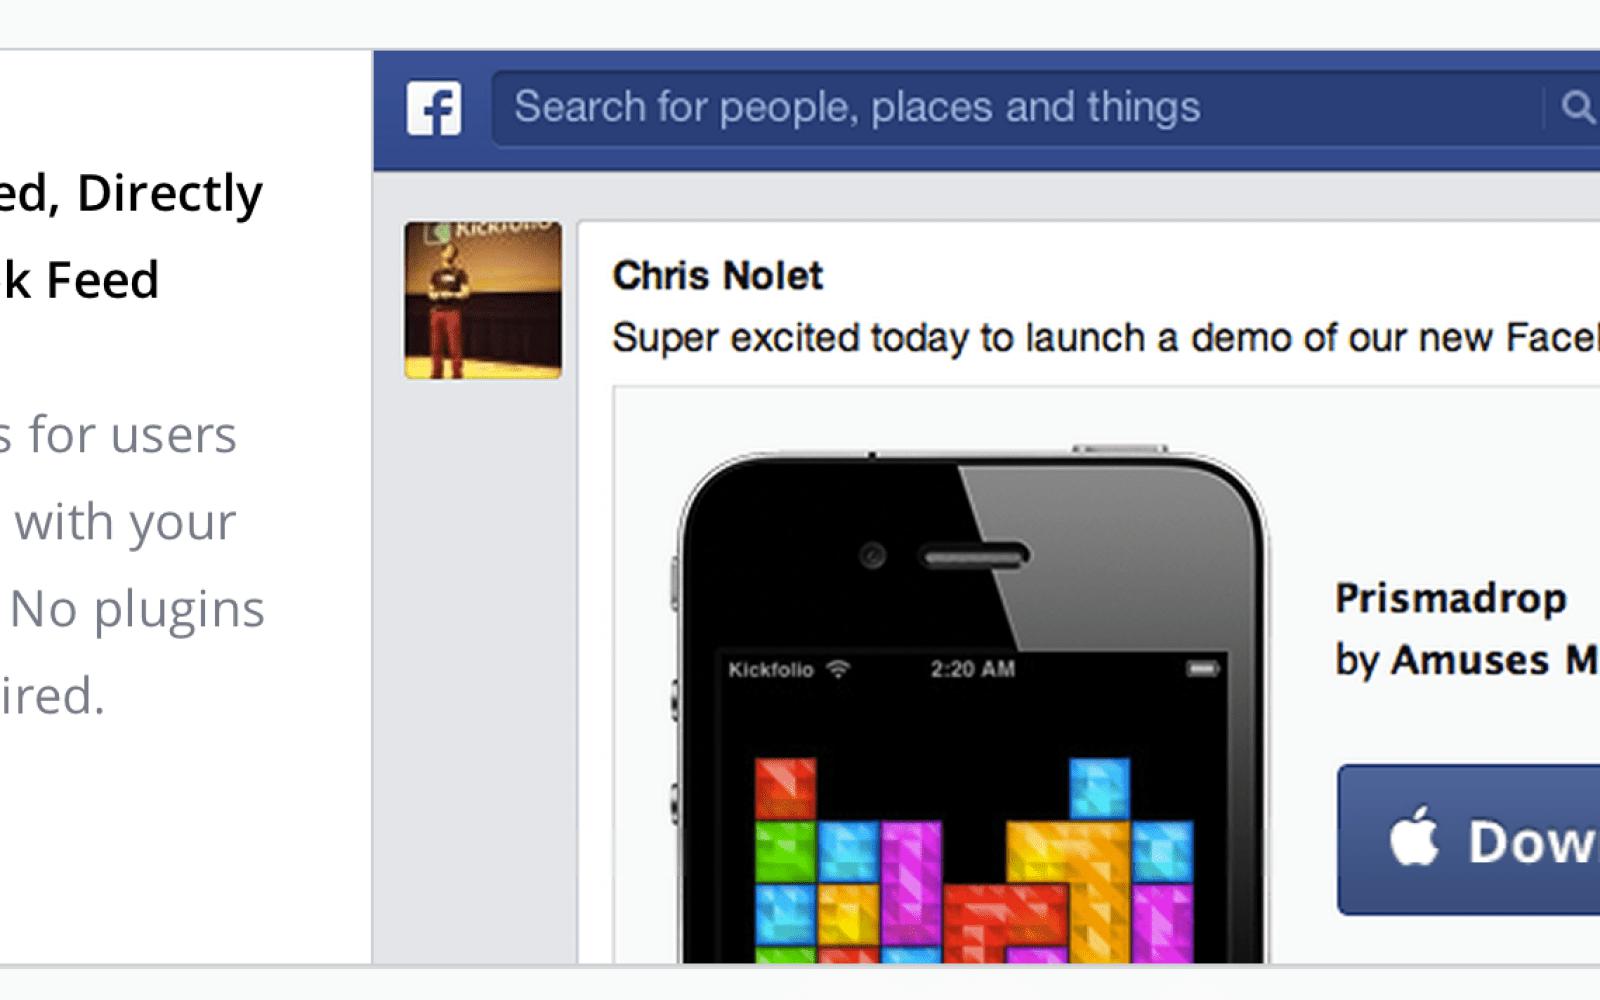 Kickfolio changes name to App.io, brings iOS app demos to Facebook news feed